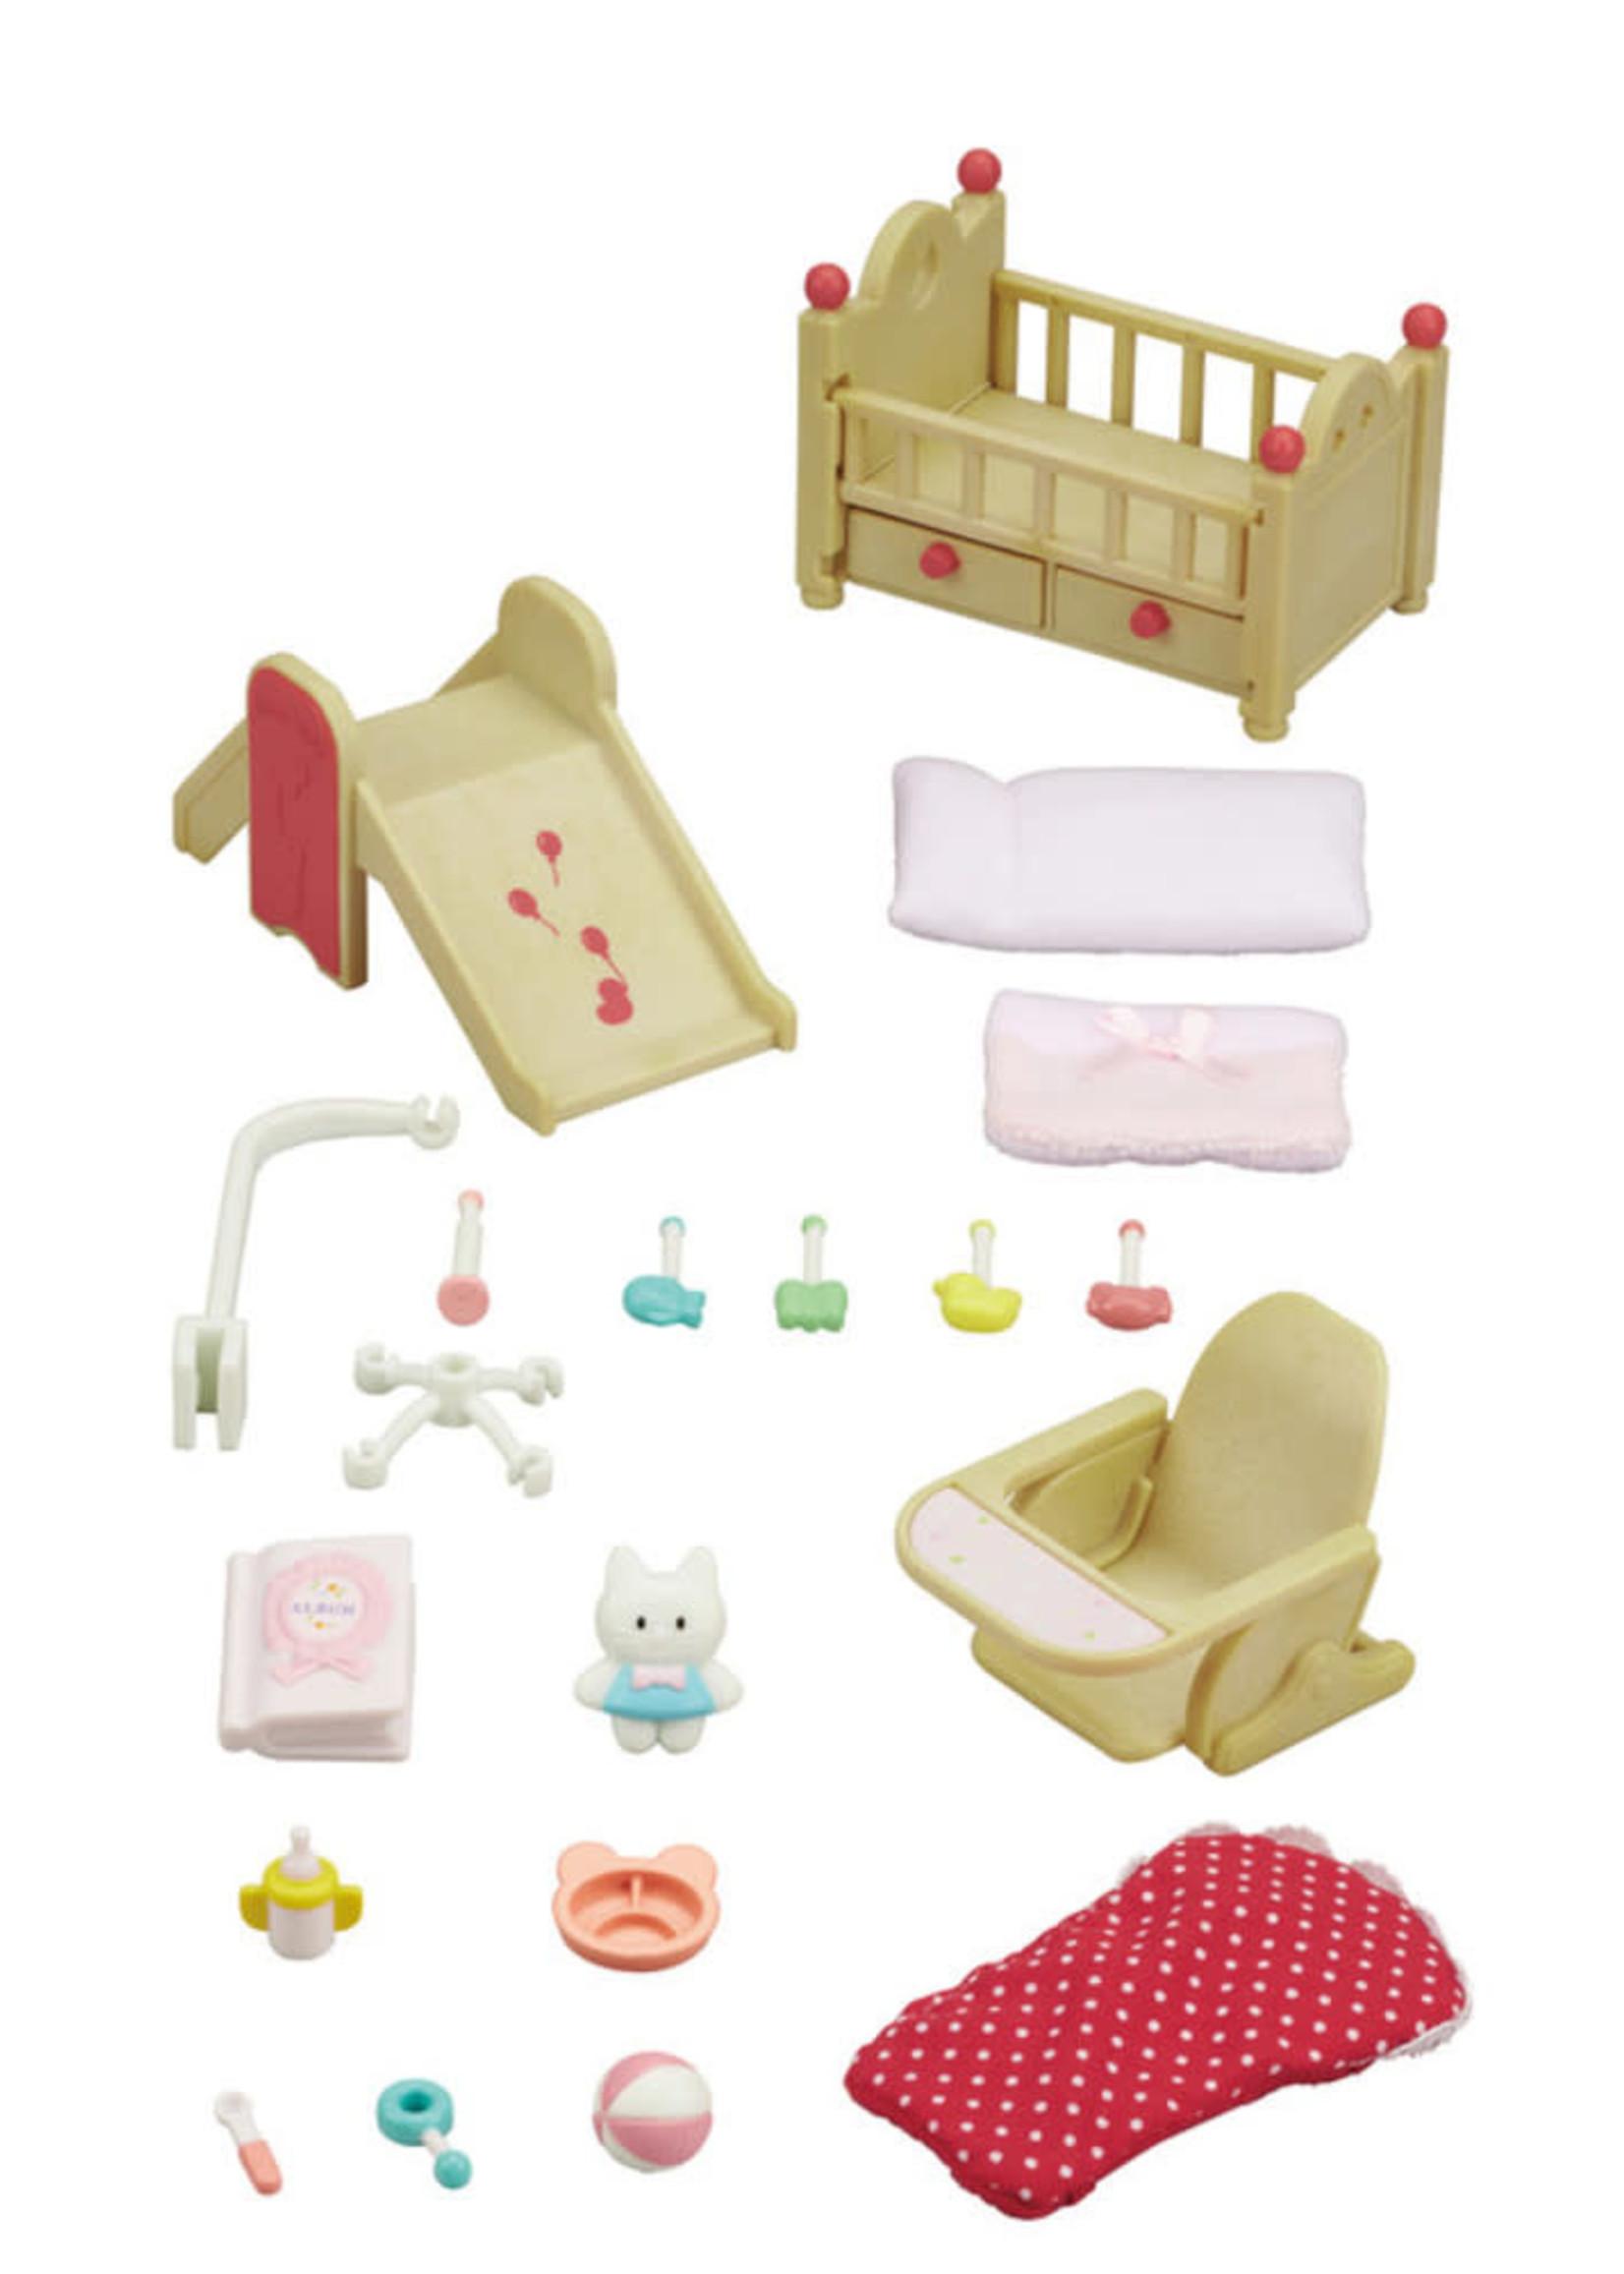 Calico Critters Baby Nursery Set